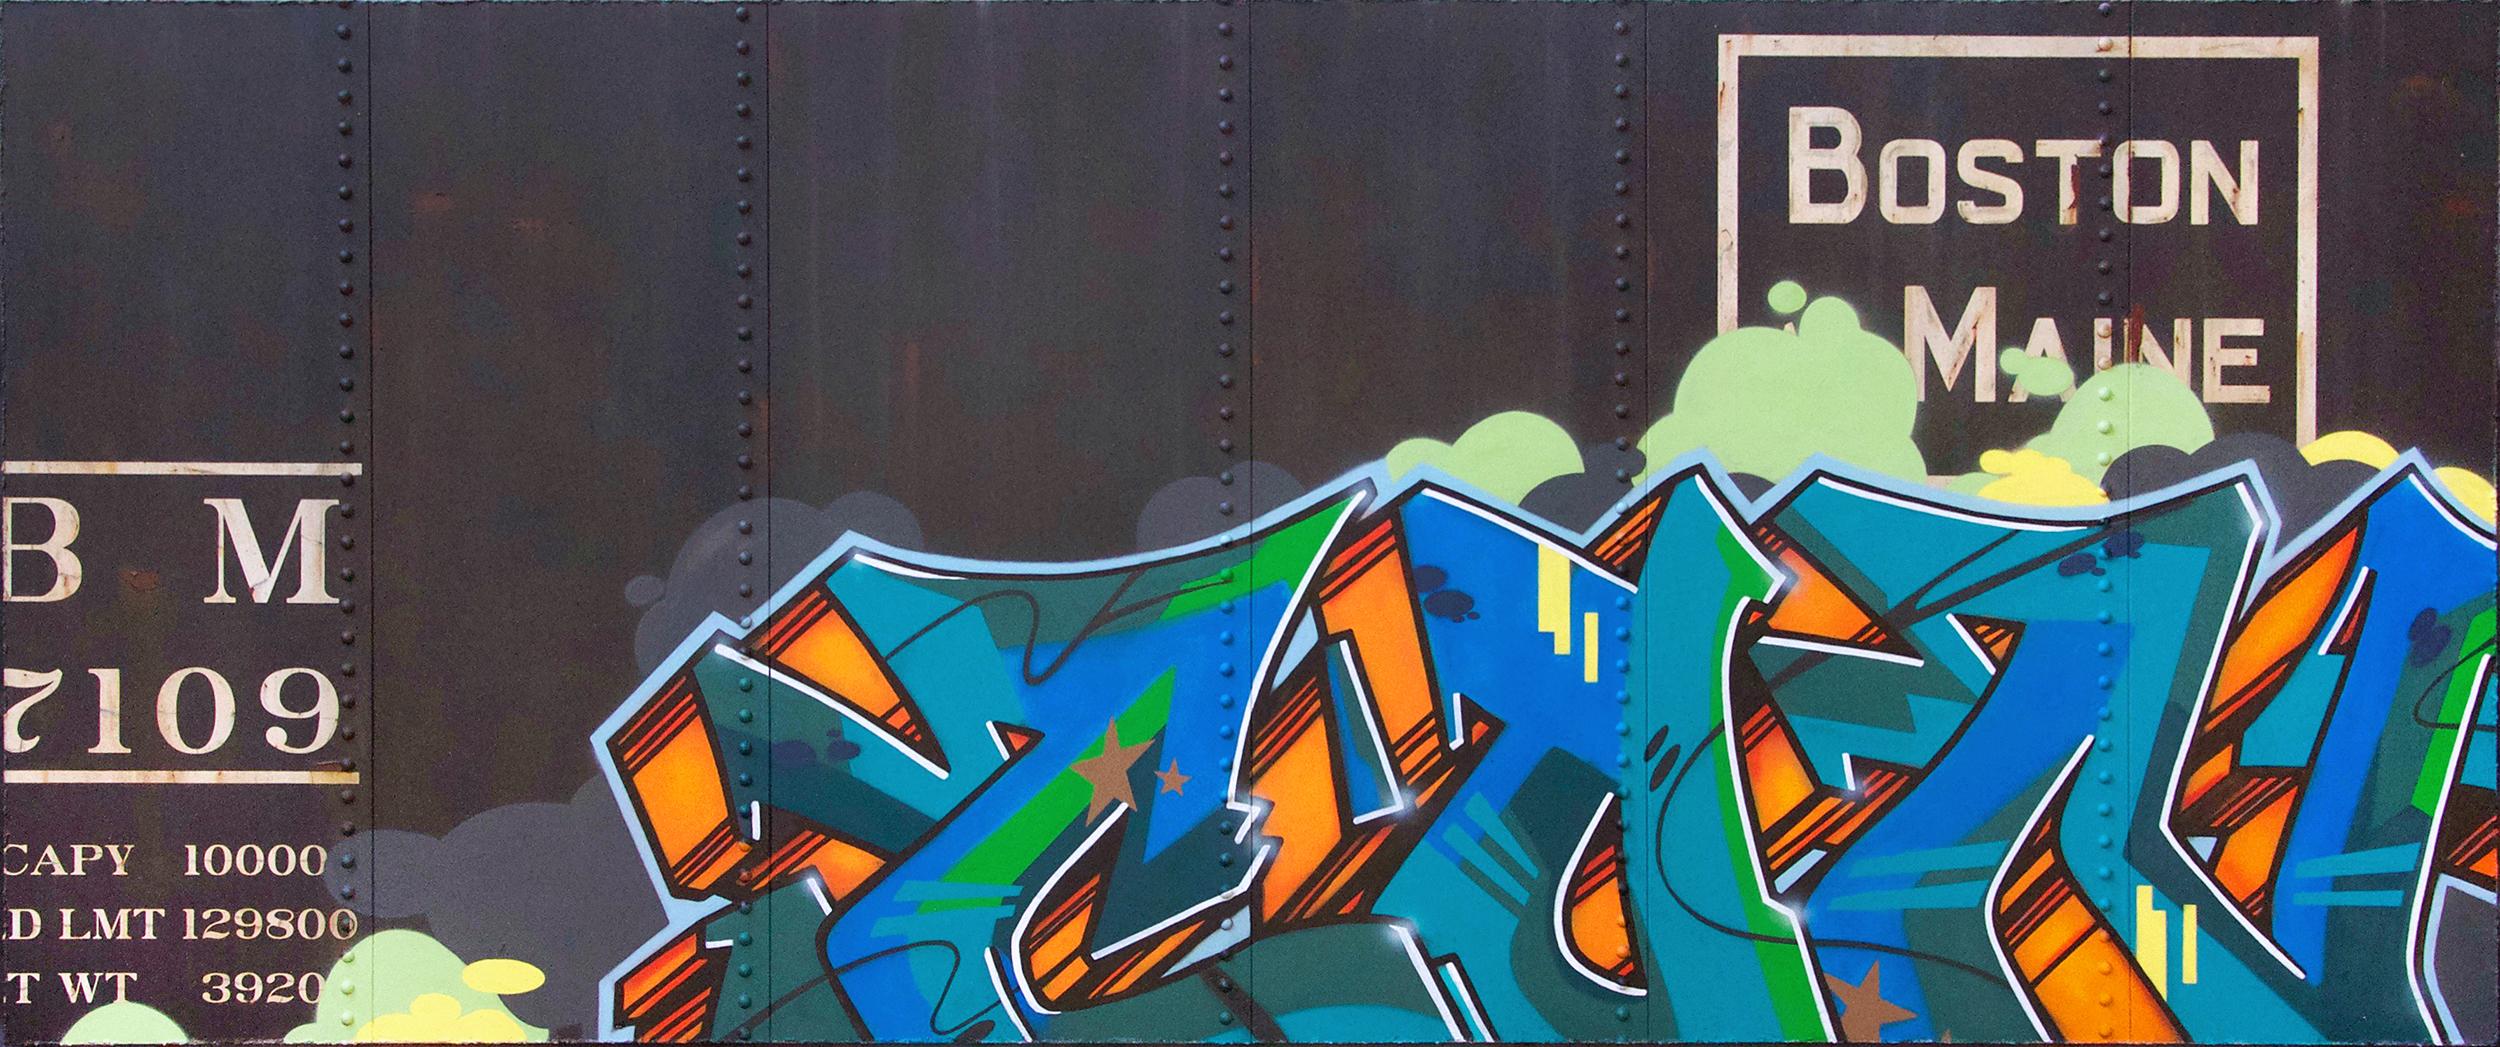 Blank Canvas #78 - Boston & Maine, Freight Train Painting, Boxcar Painting, Railroad Art, Tim Conlon Art